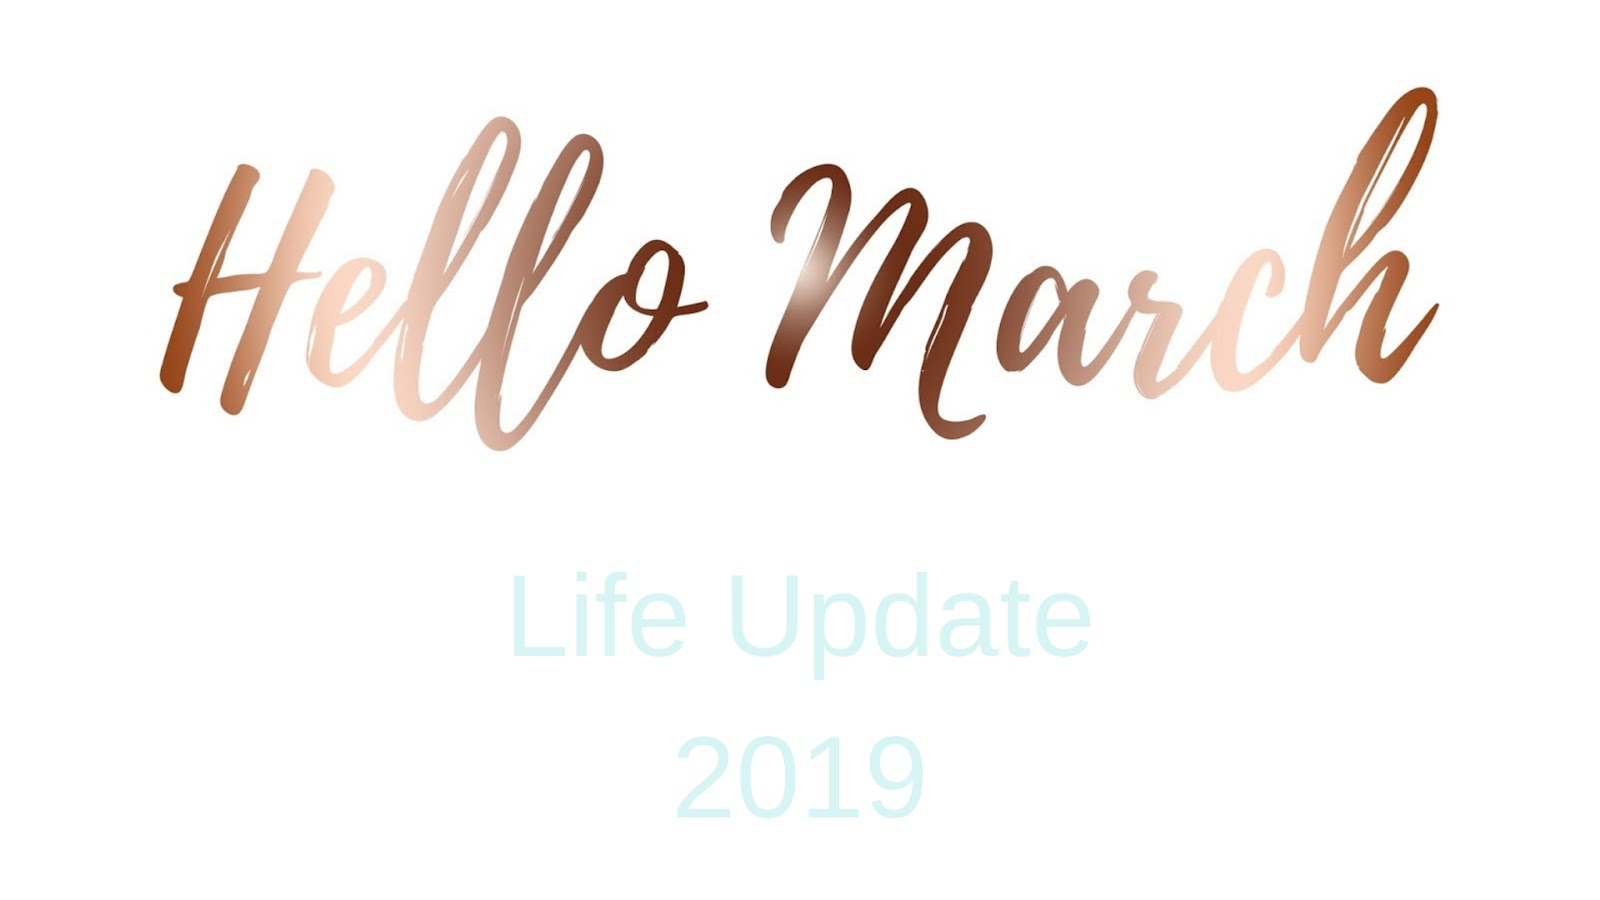 Stephanie Kamp Blog: March Life Update 2019